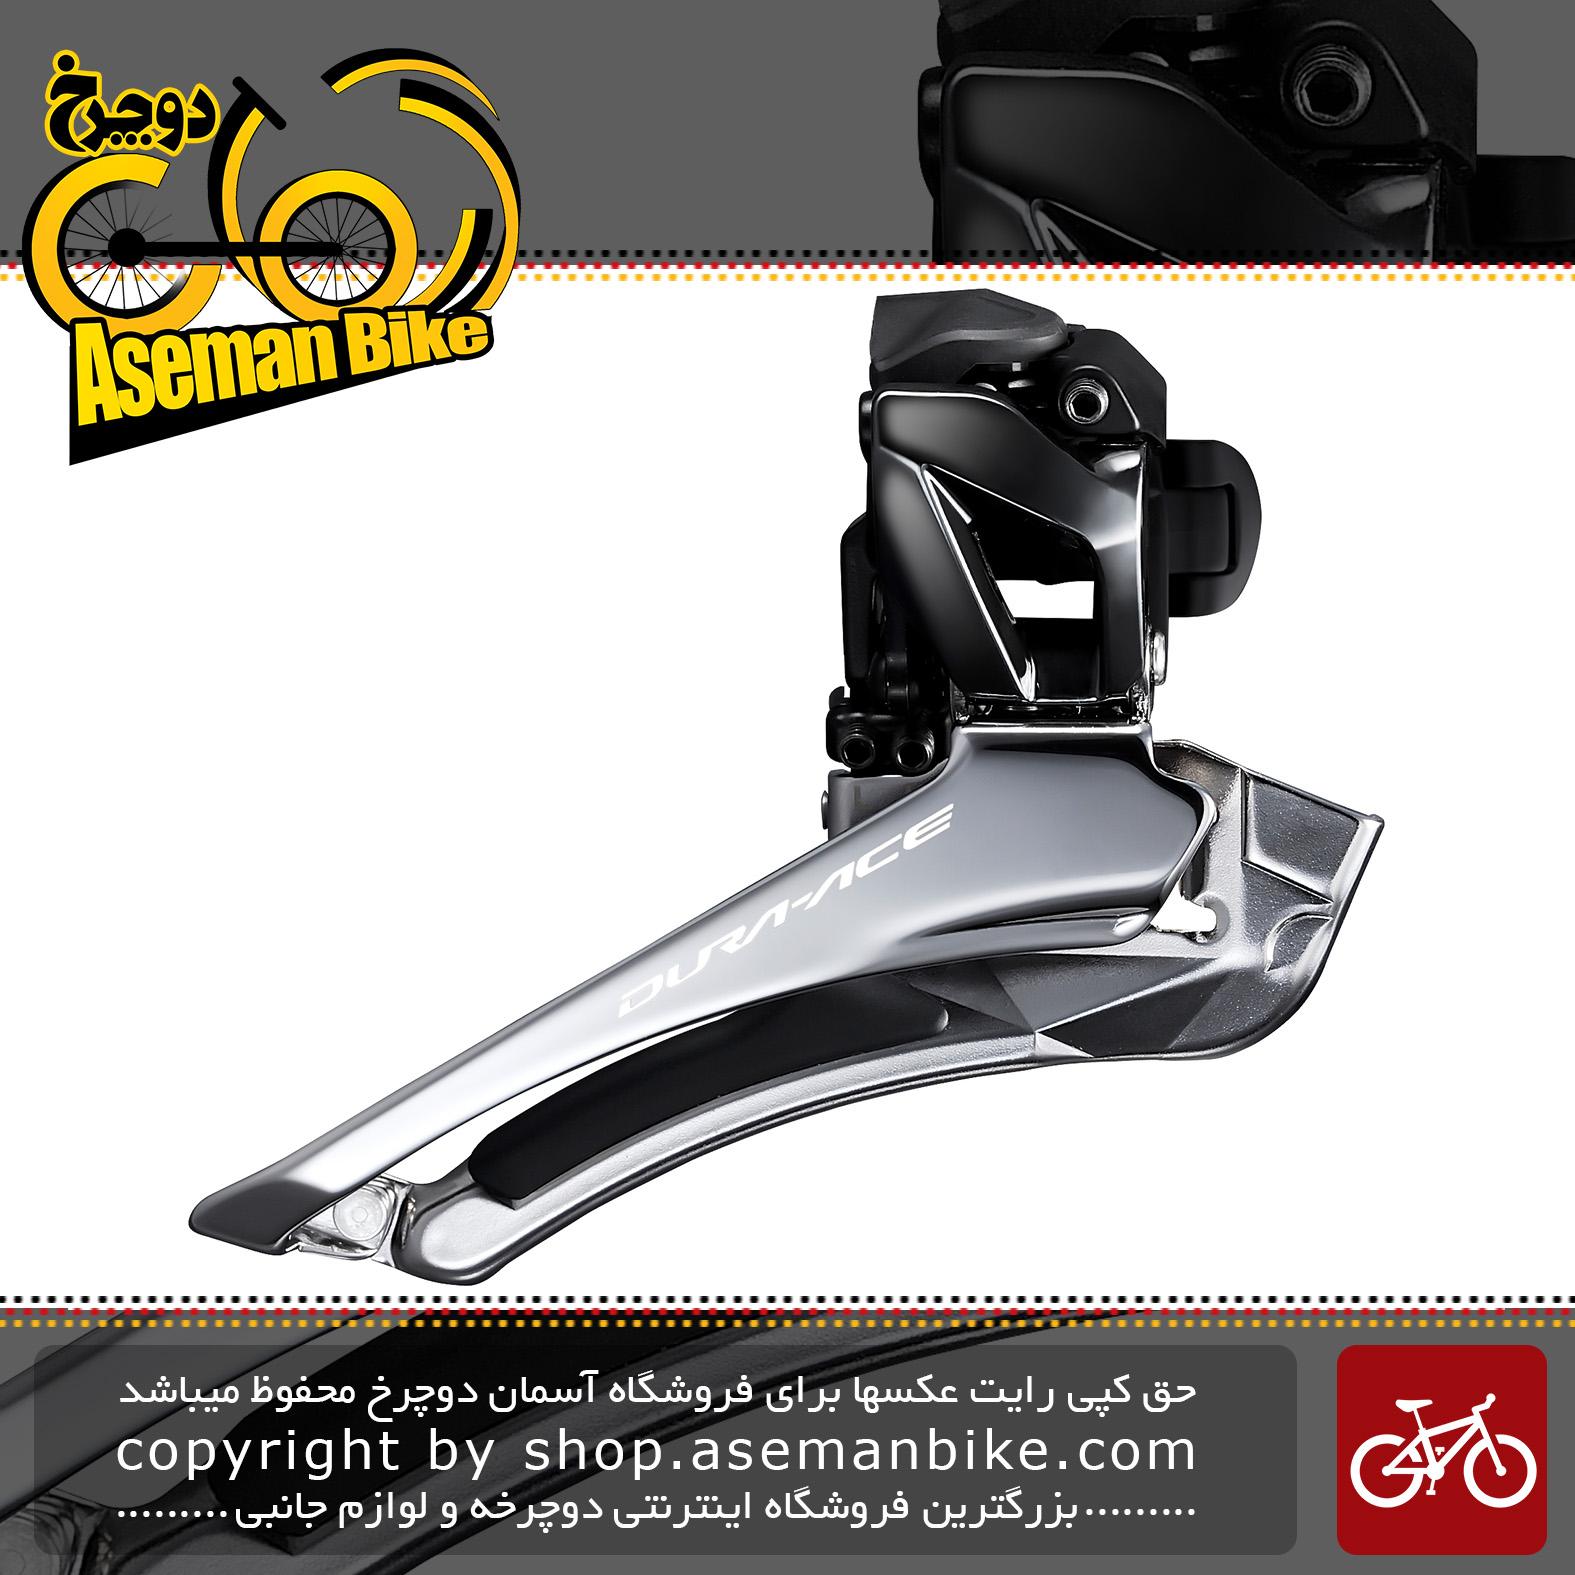 طبق عوض کن دوچرخه شیمانو دورایس Shimano Dura Ace FD R9100 B Front Derailleur (2x11-speed)